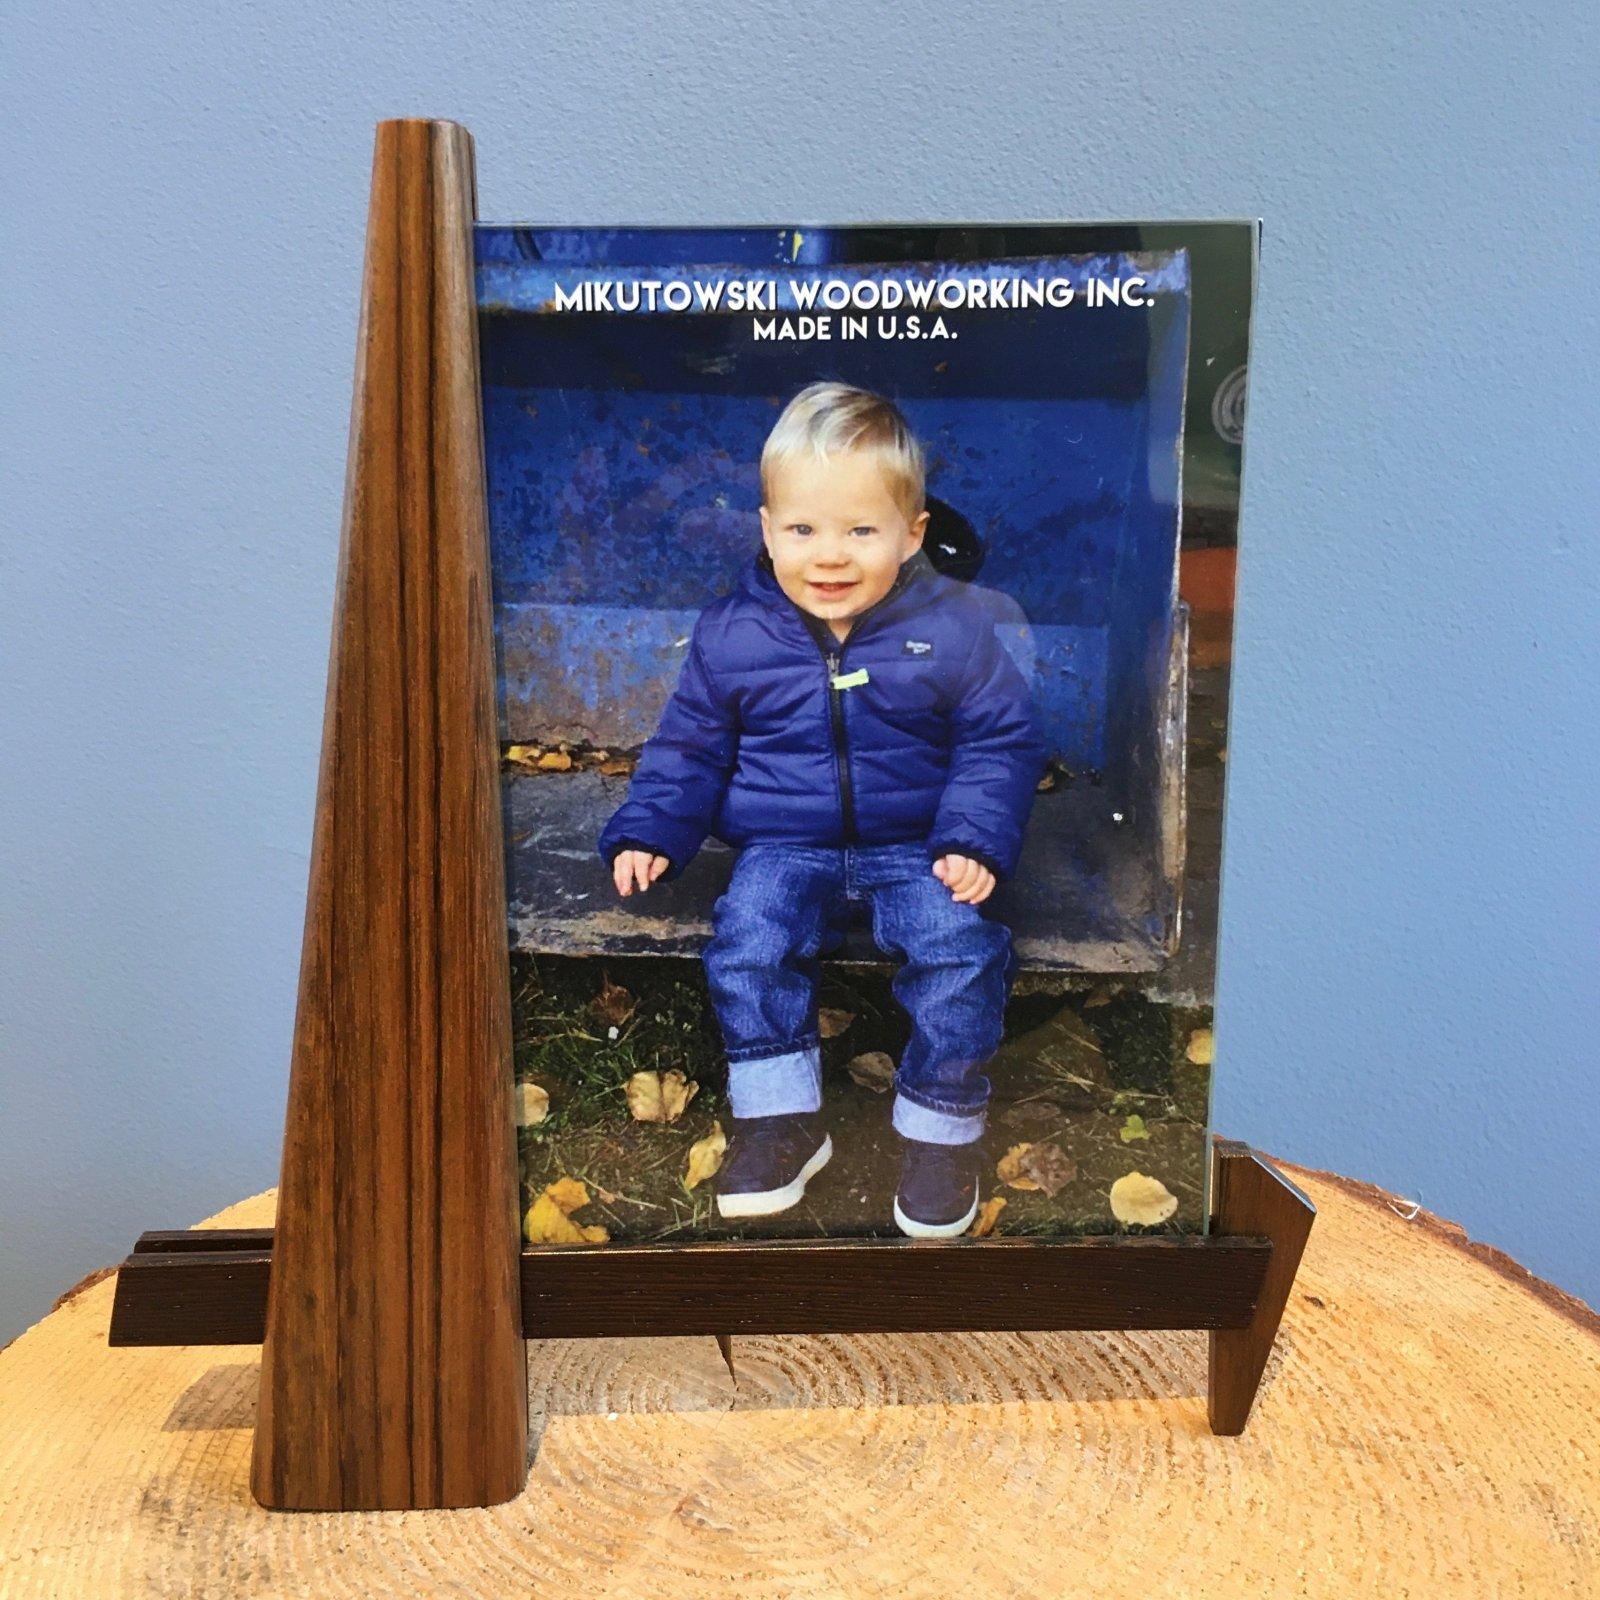 Mikutowski 5x7 Desk Frame - Shedua